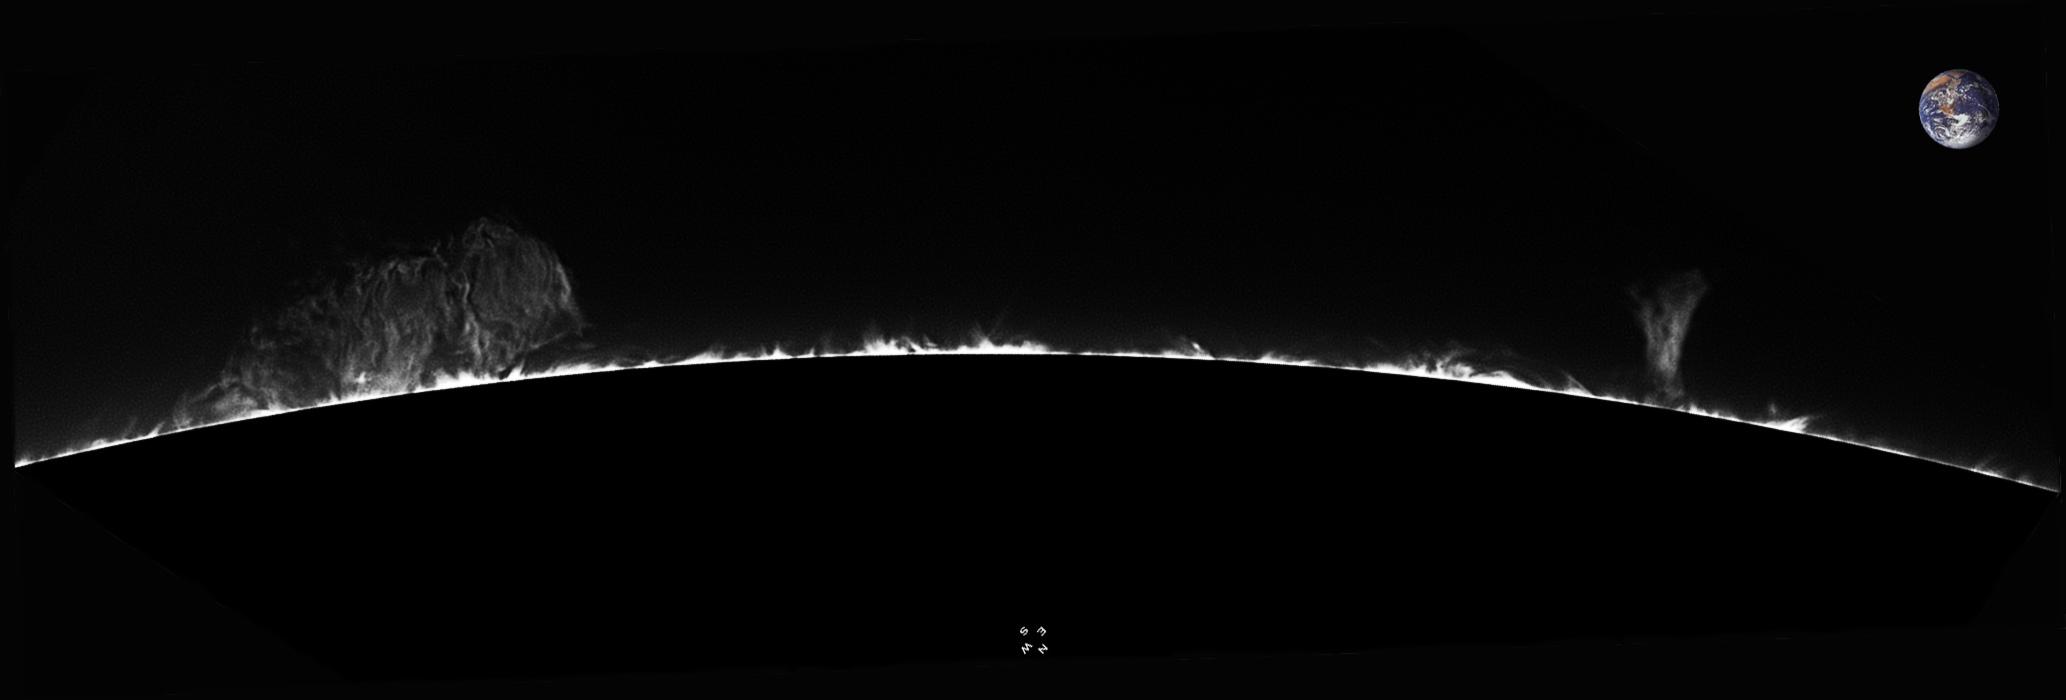 Limbe SE - 217-236°N - 03 Juin 2018